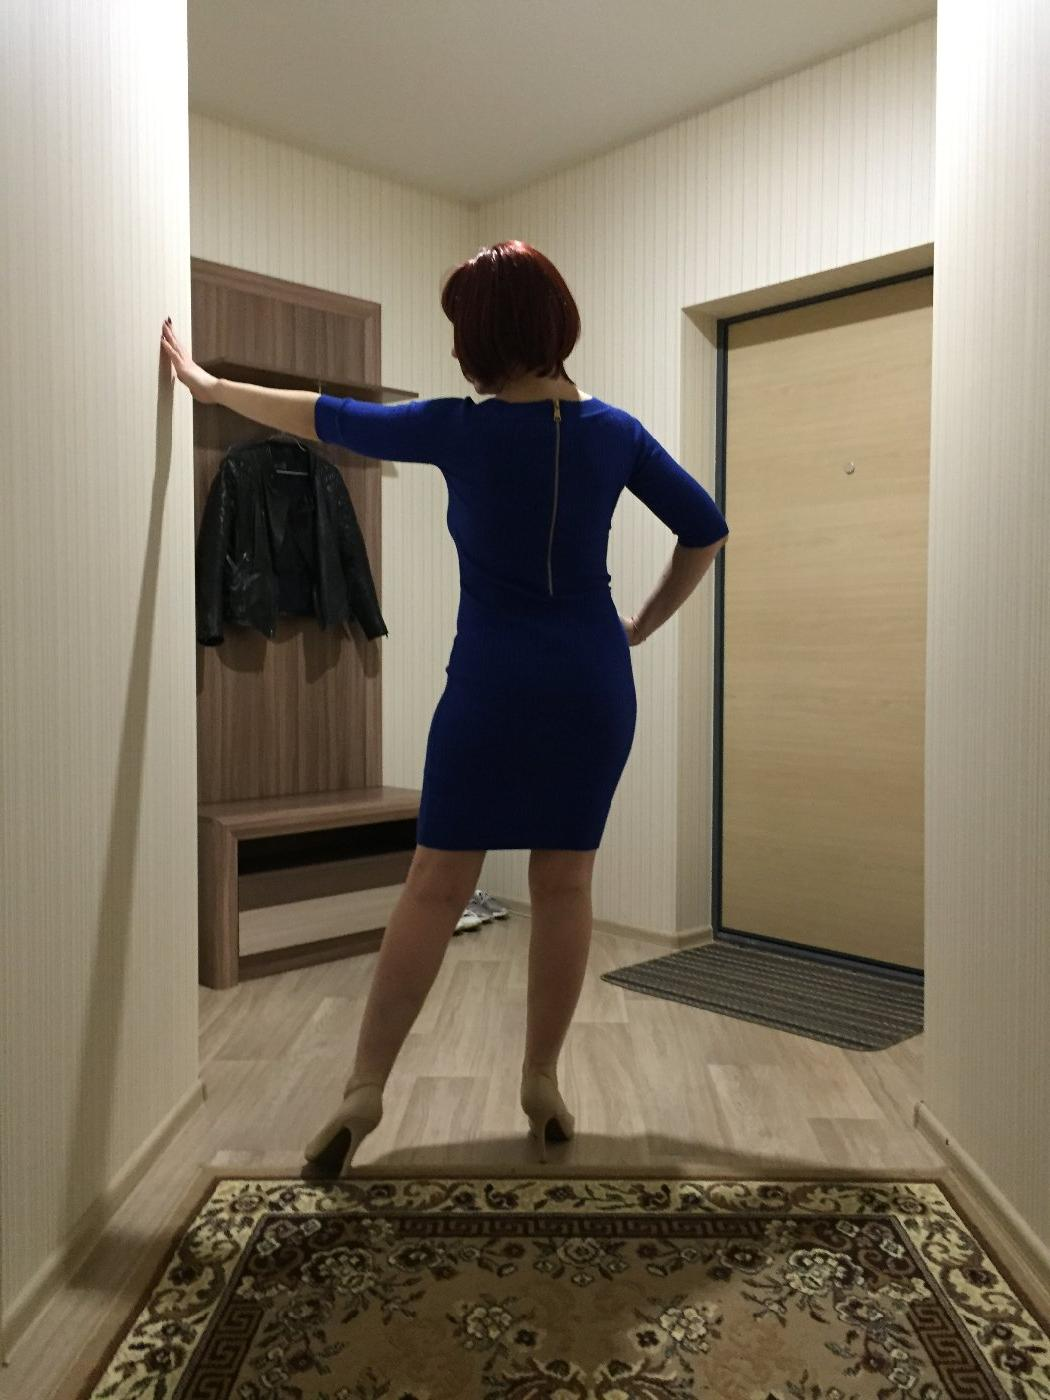 Путана АЛЛА, 38 лет, метро улица Дмитриевского